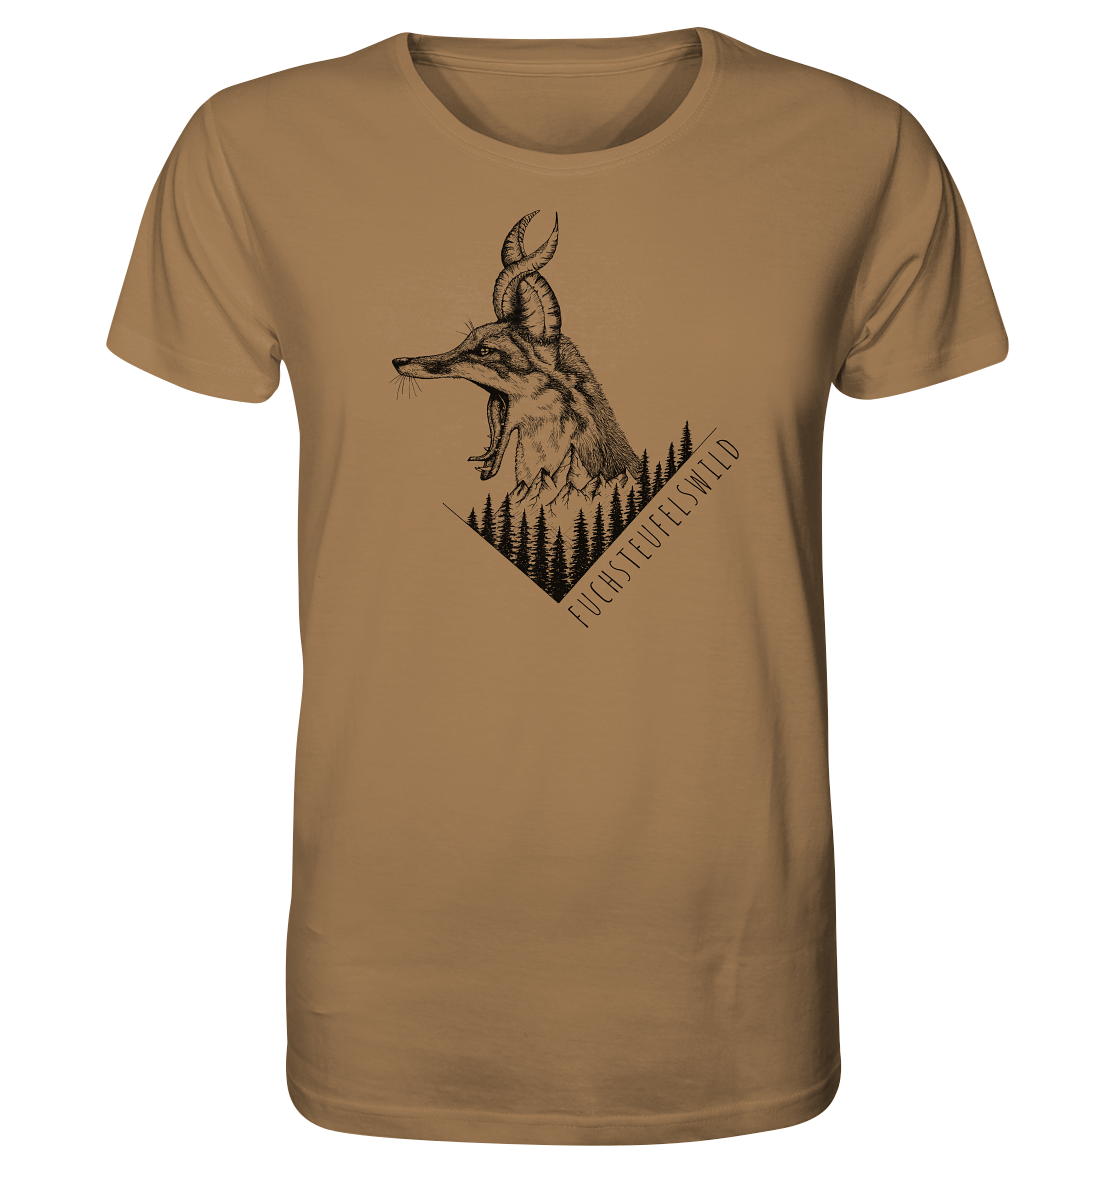 front-organic-shirt-a17c55-1116x-6.png